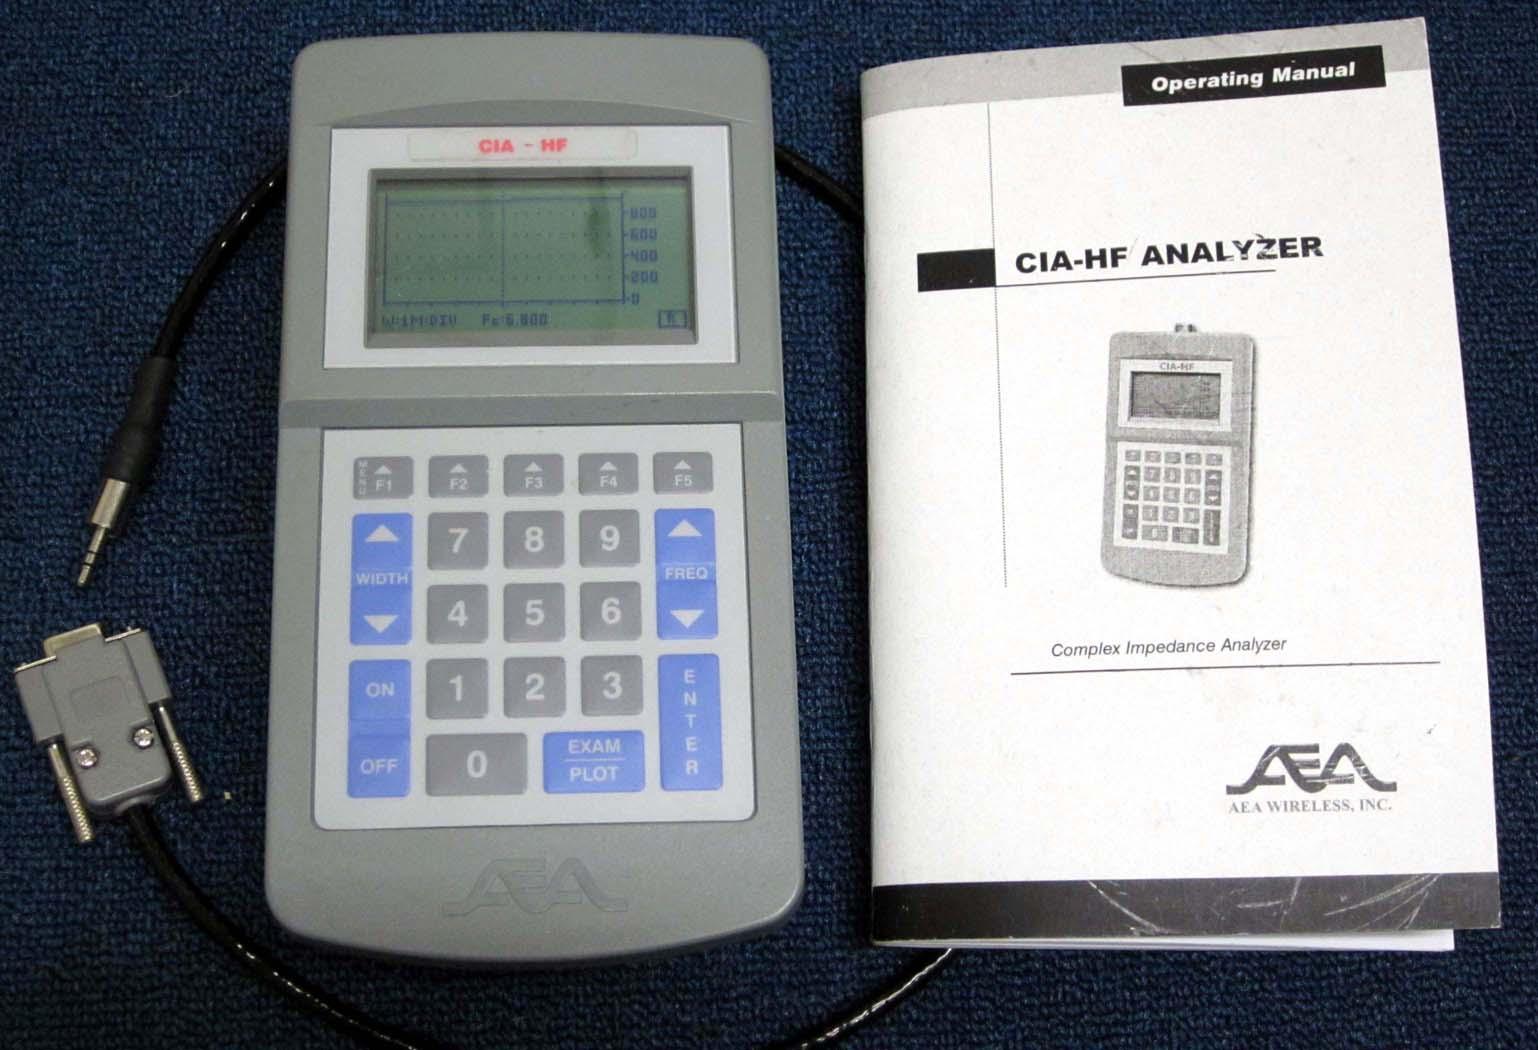 IMG_2049 Antennimittari AEA CIA-HF 0,4 - 54 MHz (c) OH7HJ.JPG